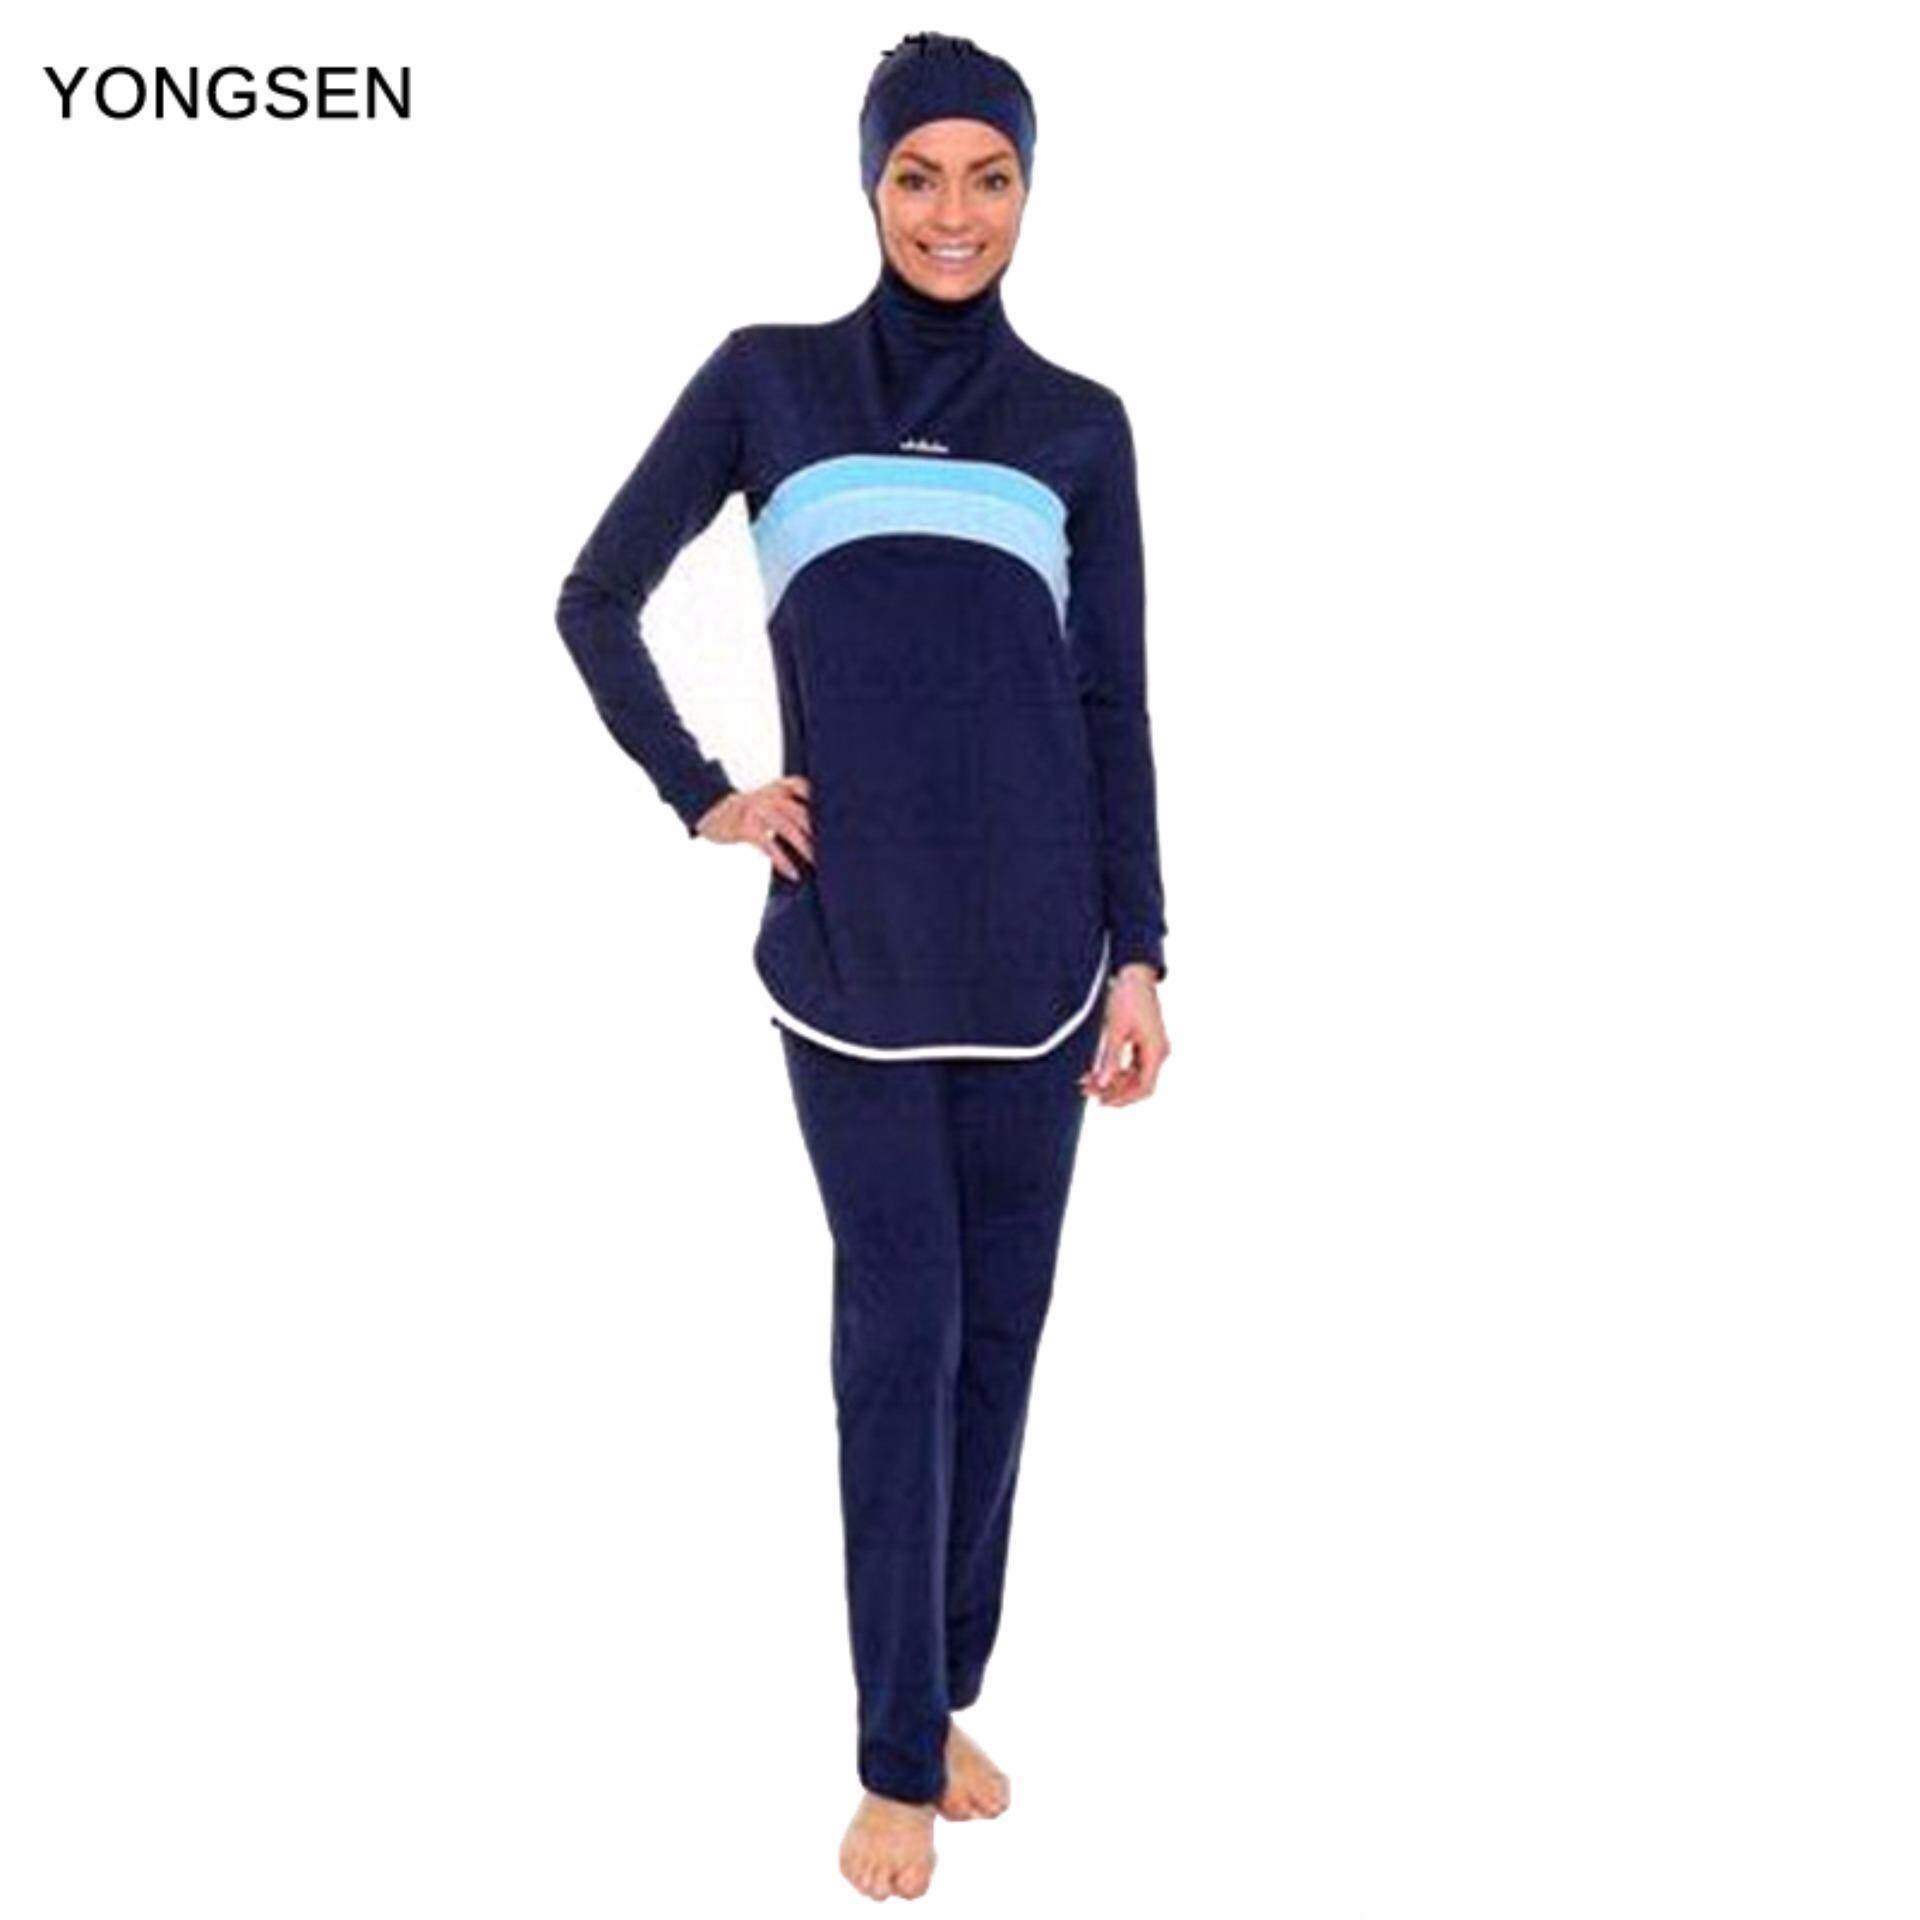 fef3167b5 YONGSEN Islamic Swim Wear Muslim Swimwear Full Cover Hijab Swimming Modest  Swimsuits Plus Size Women Burkinis